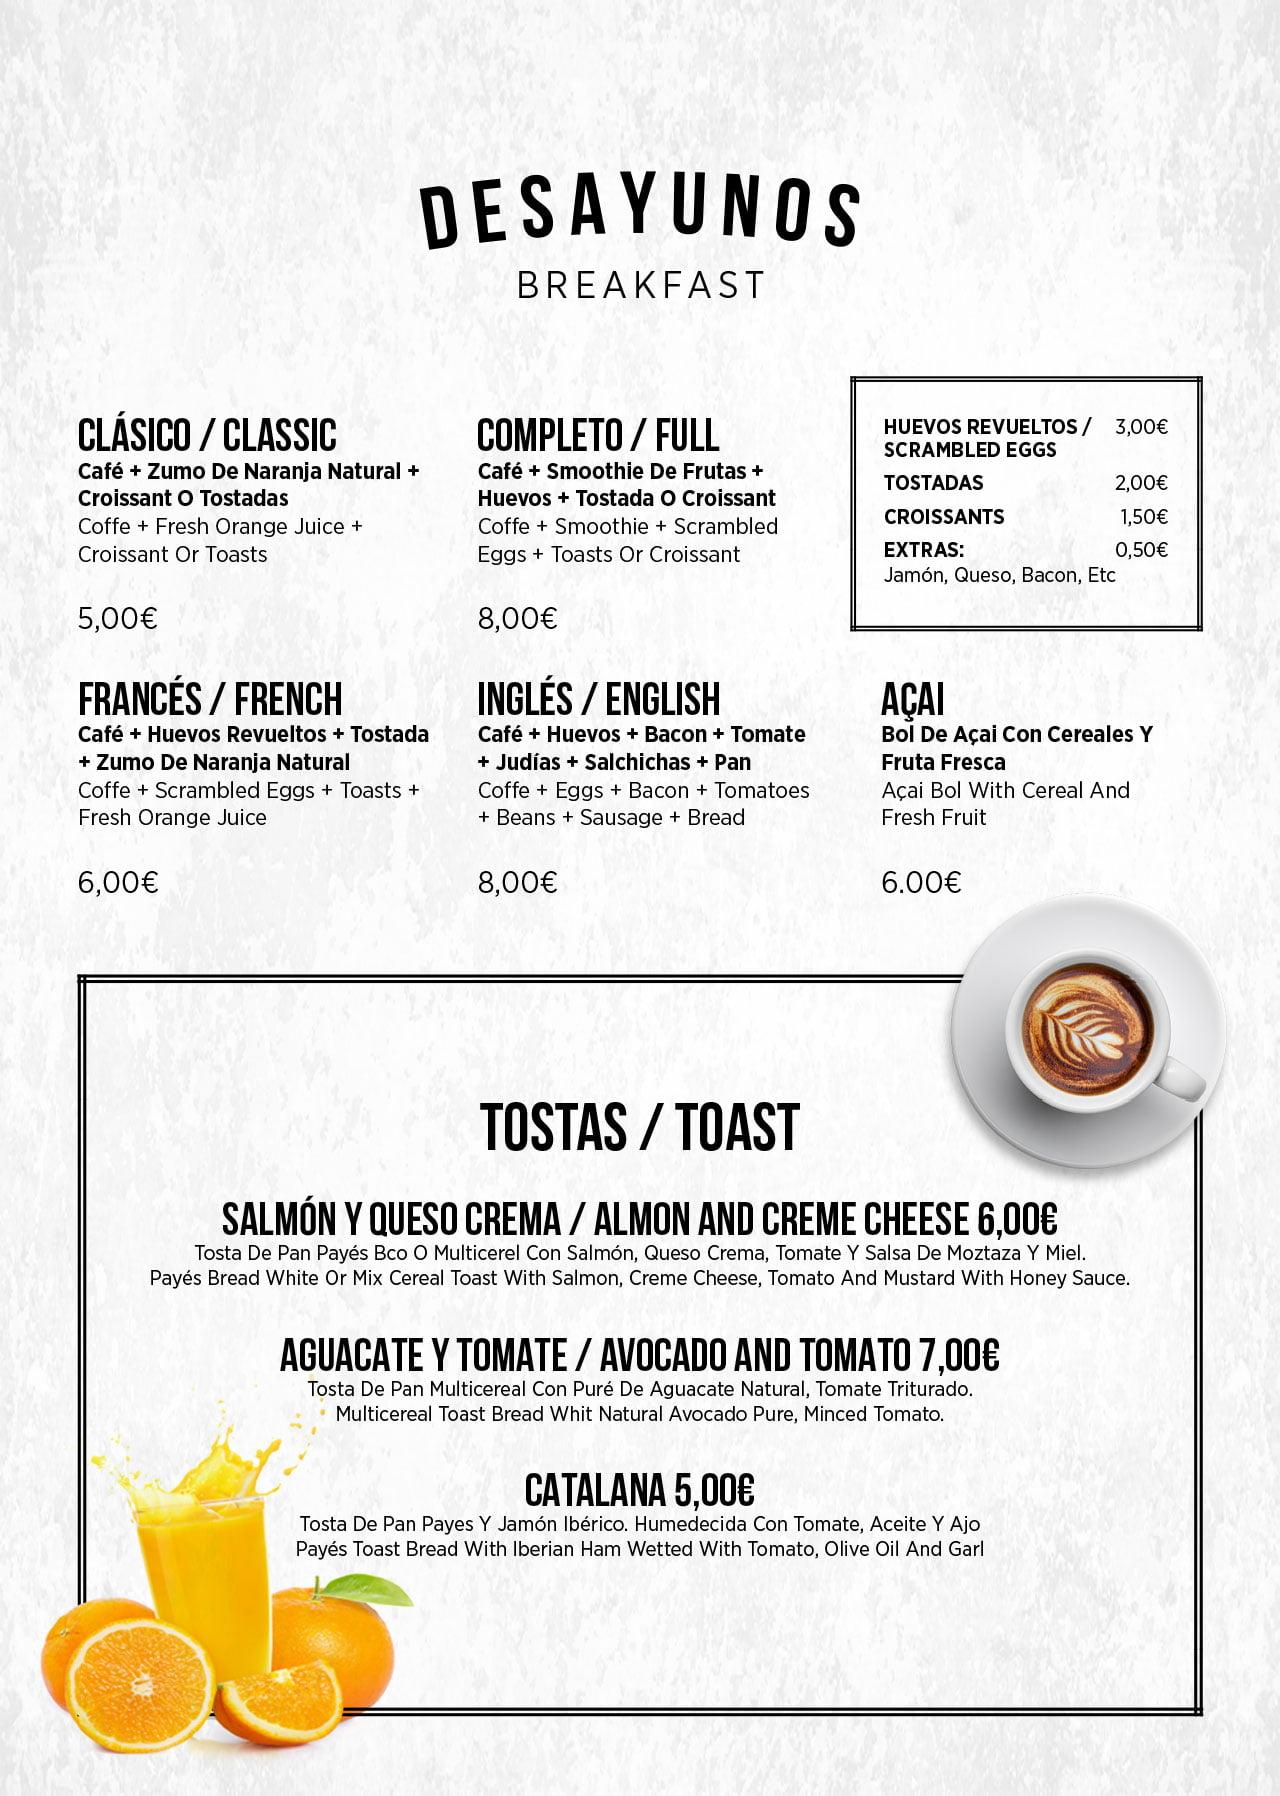 Breakfast Menu Template Design Blue Duck 2019